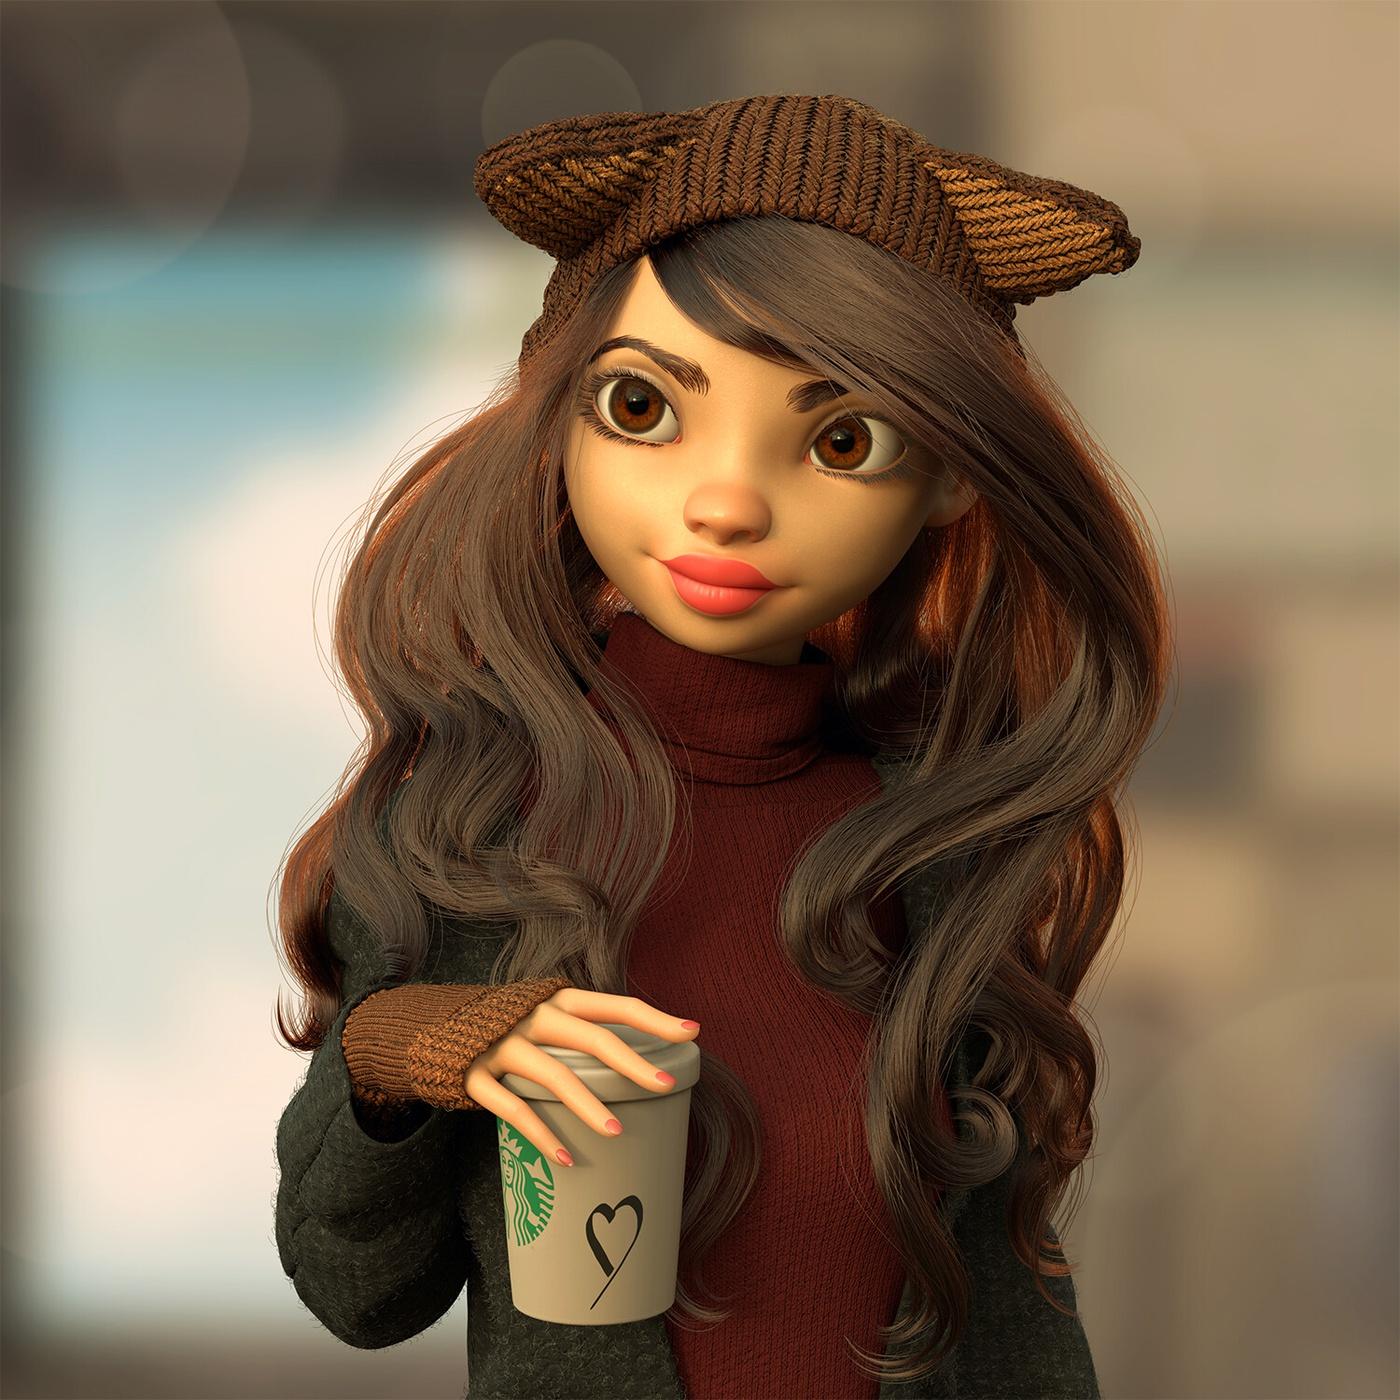 autumn beanie hot beverage starbucks female character design